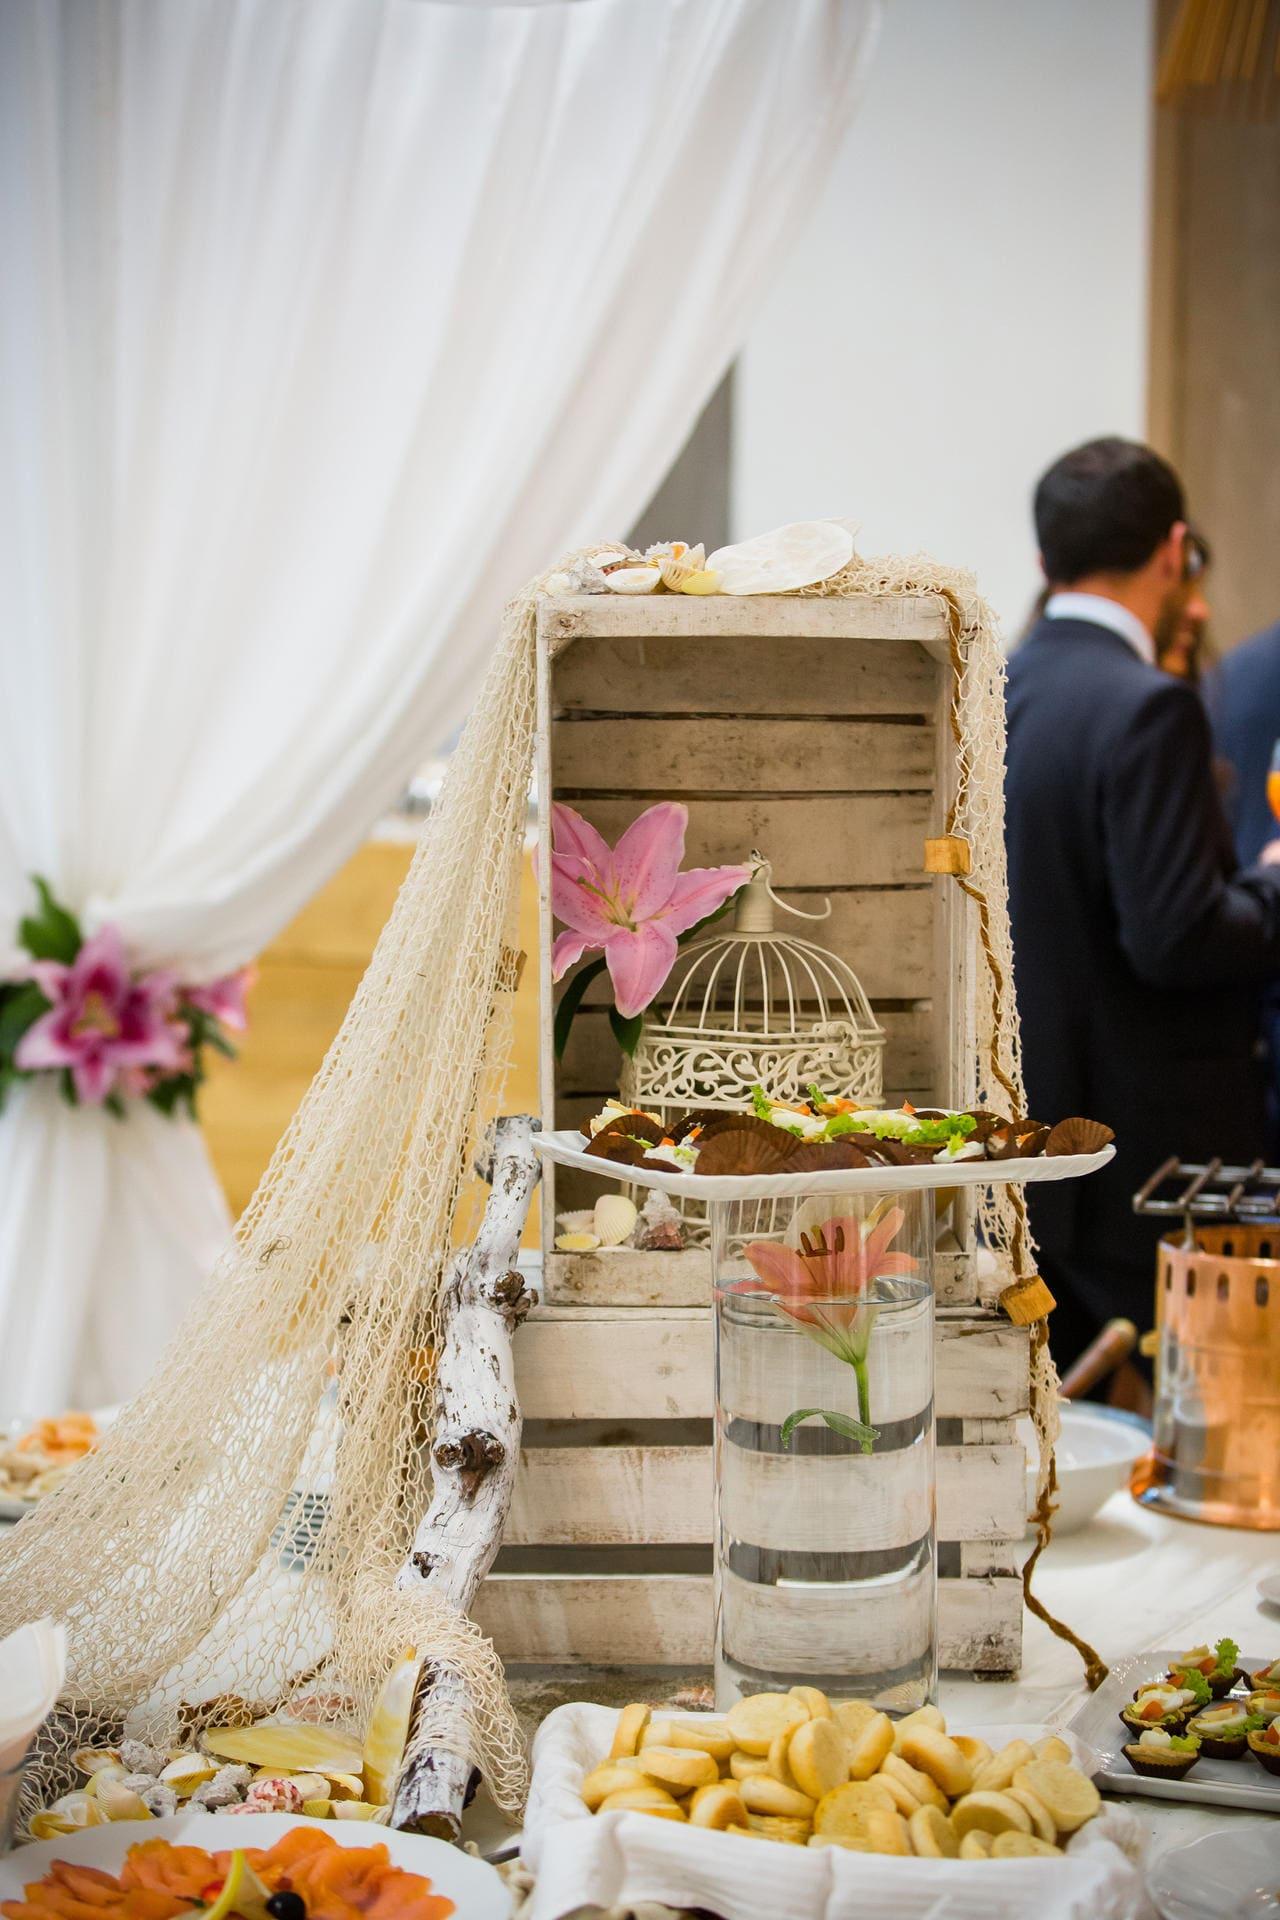 14.05.2016 - Wedding